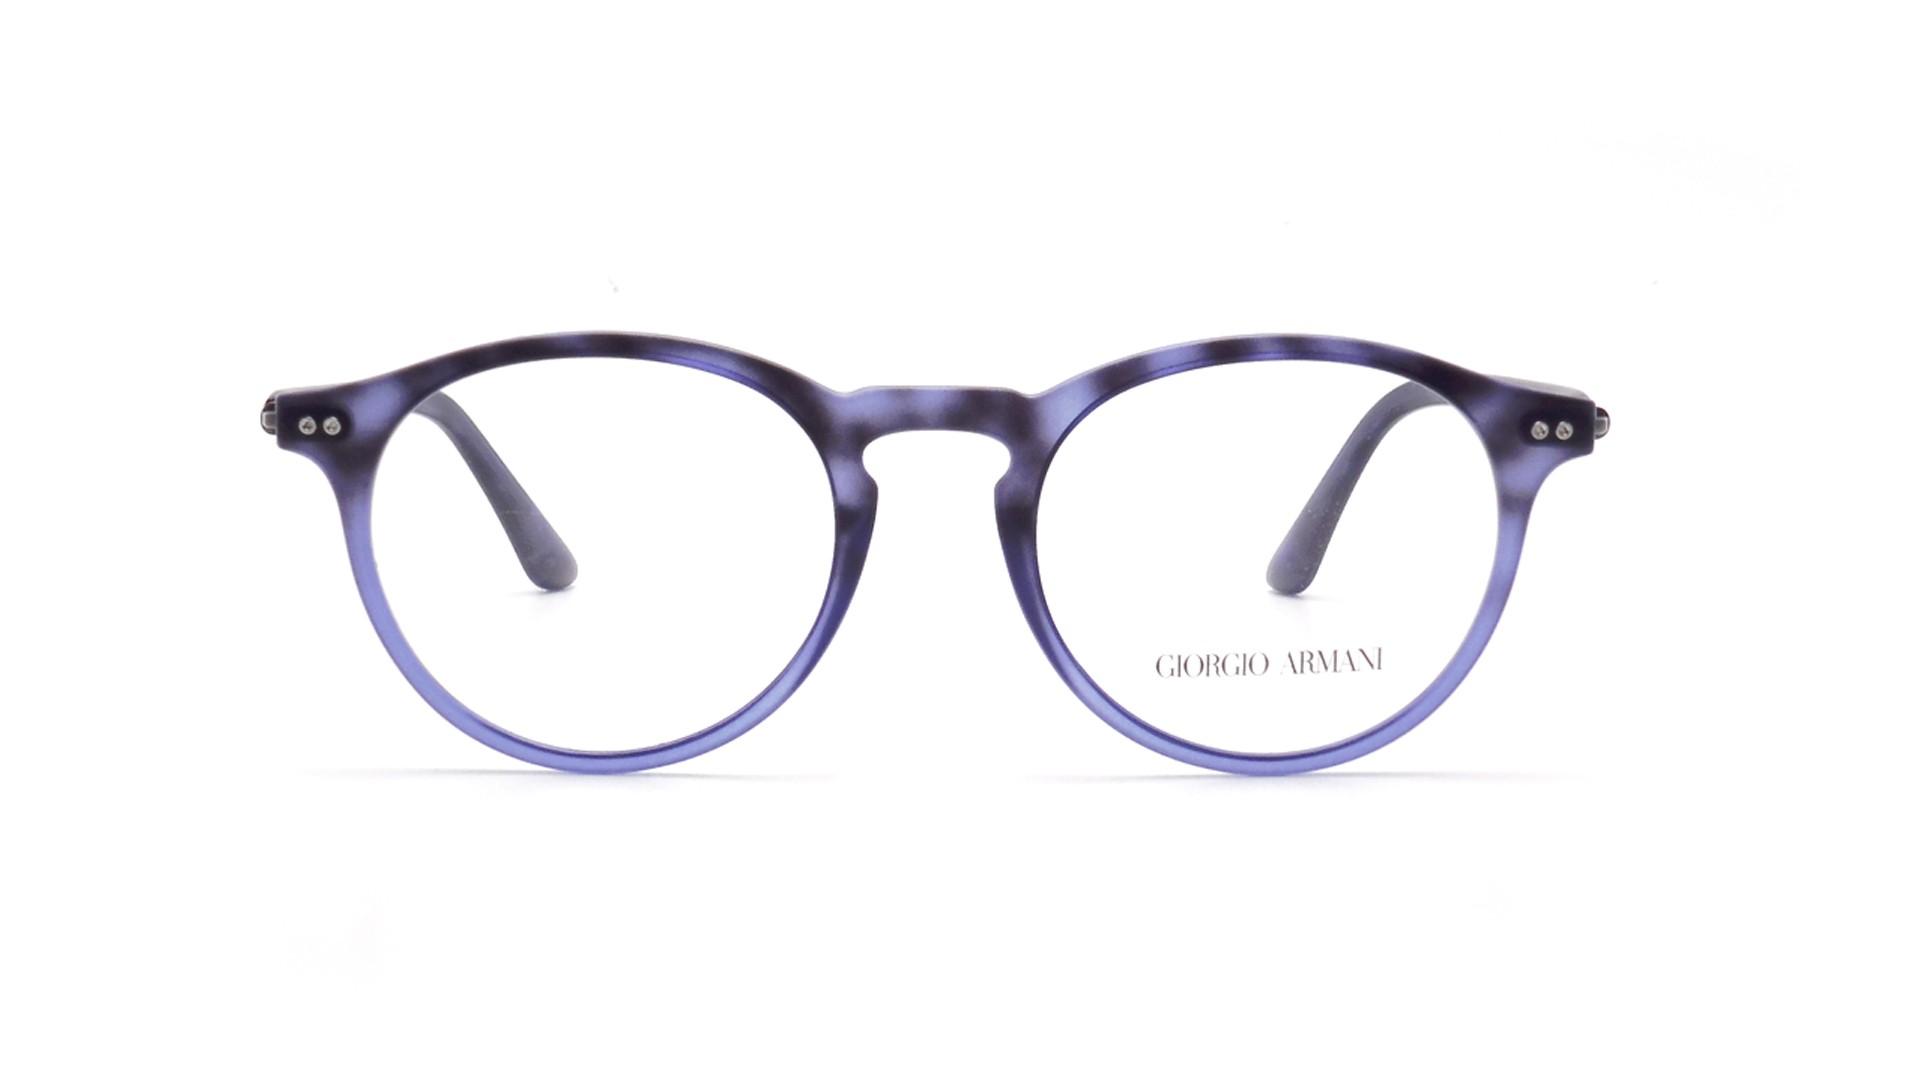 479a5f35f3b0 Eyeglasses Giorgio Armani Frames of Life Blue AR7040 5313 48-19 Medium